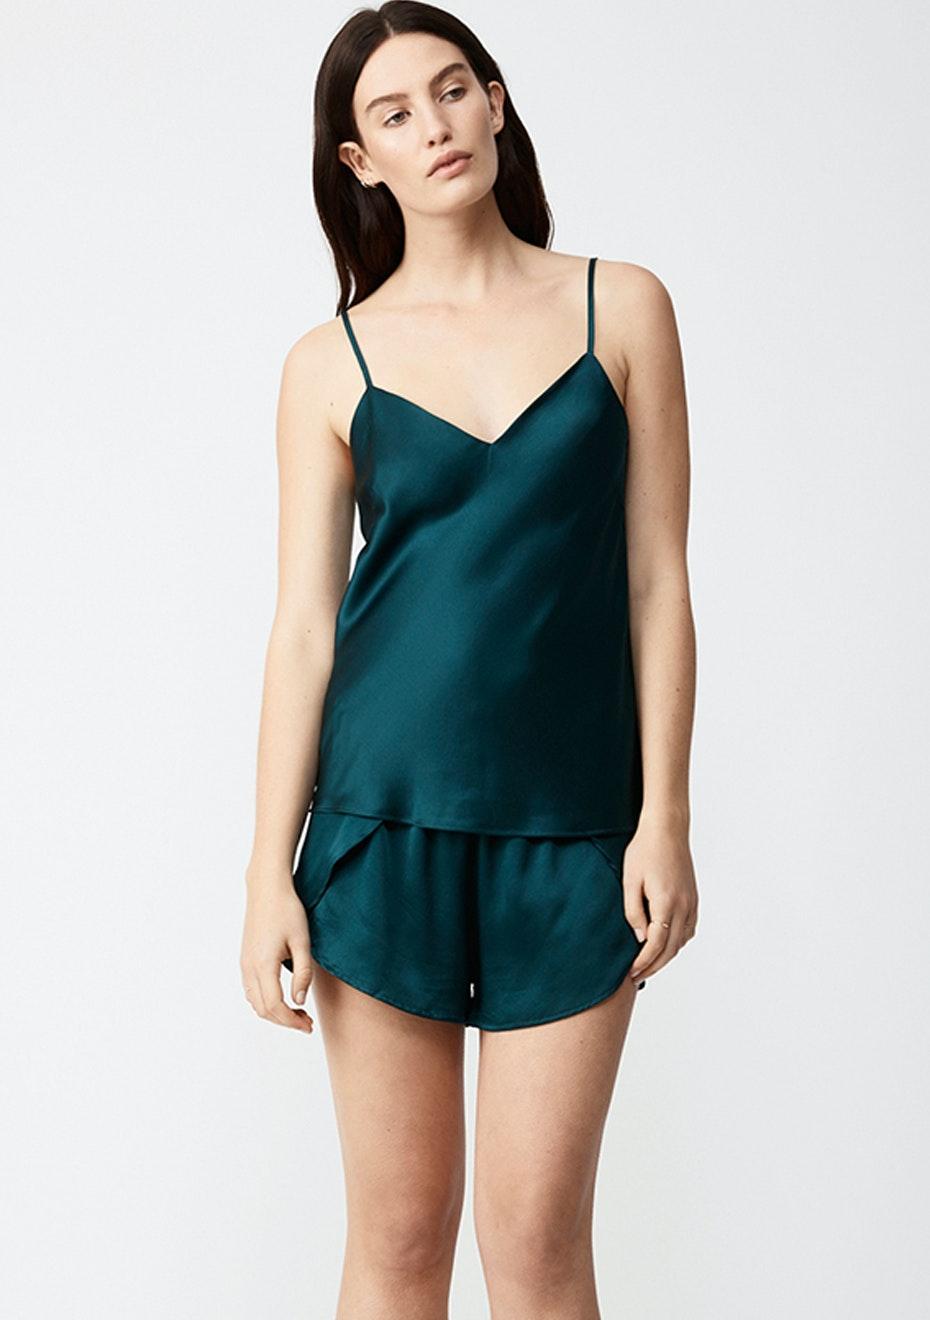 NATALIJA - Silk Camisole - Emerald